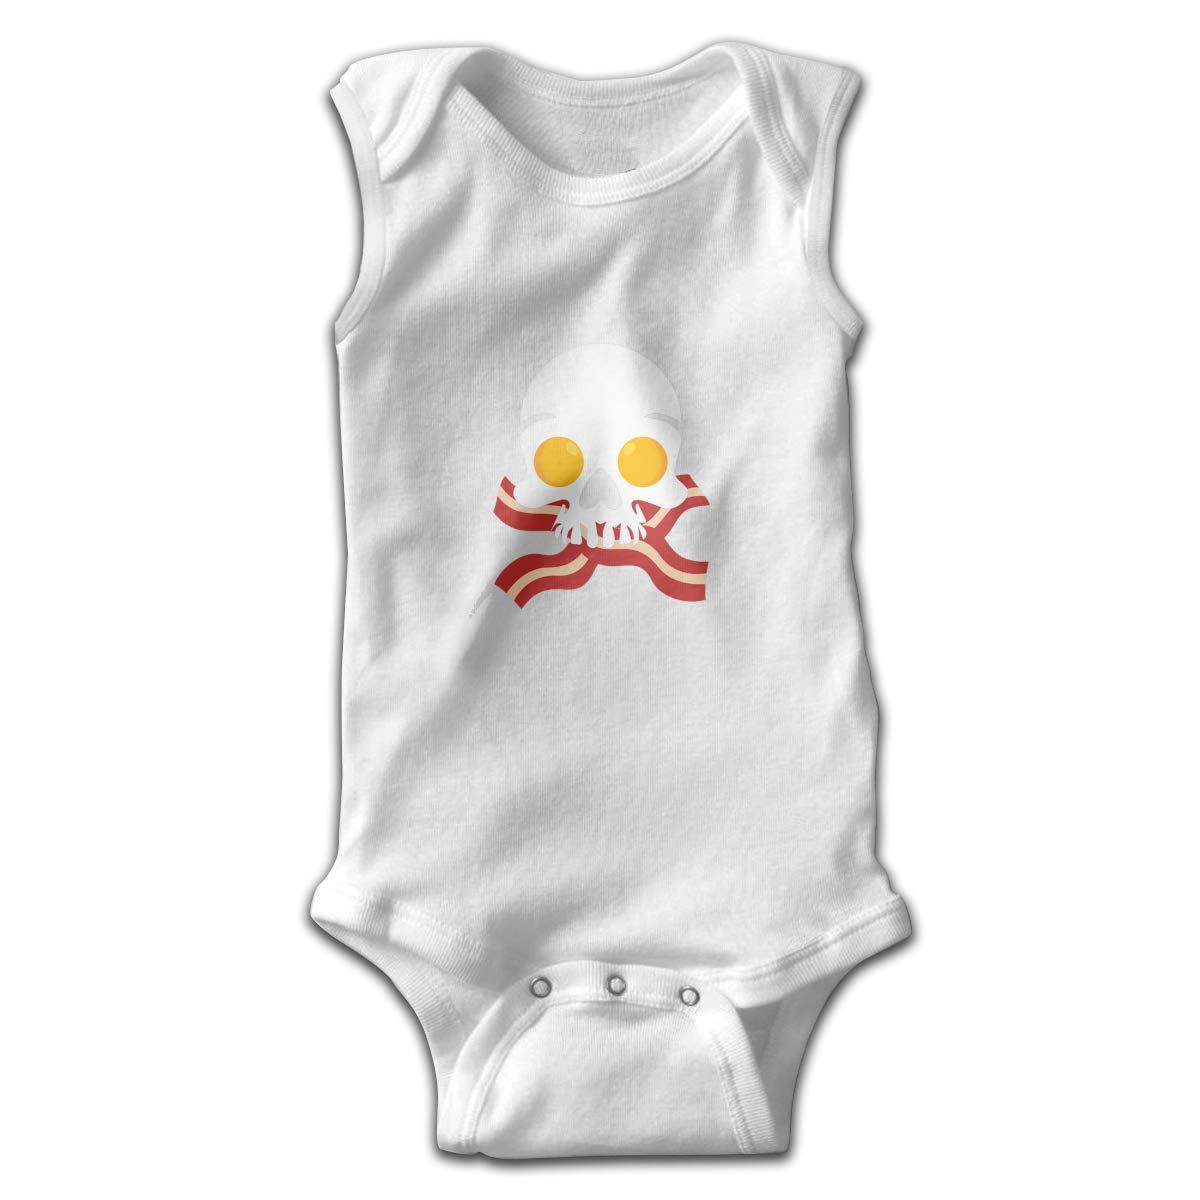 Dunpaiaa Eggs Bacon Skull Logo Smalls Baby Onesie,Infant Bodysuit Black